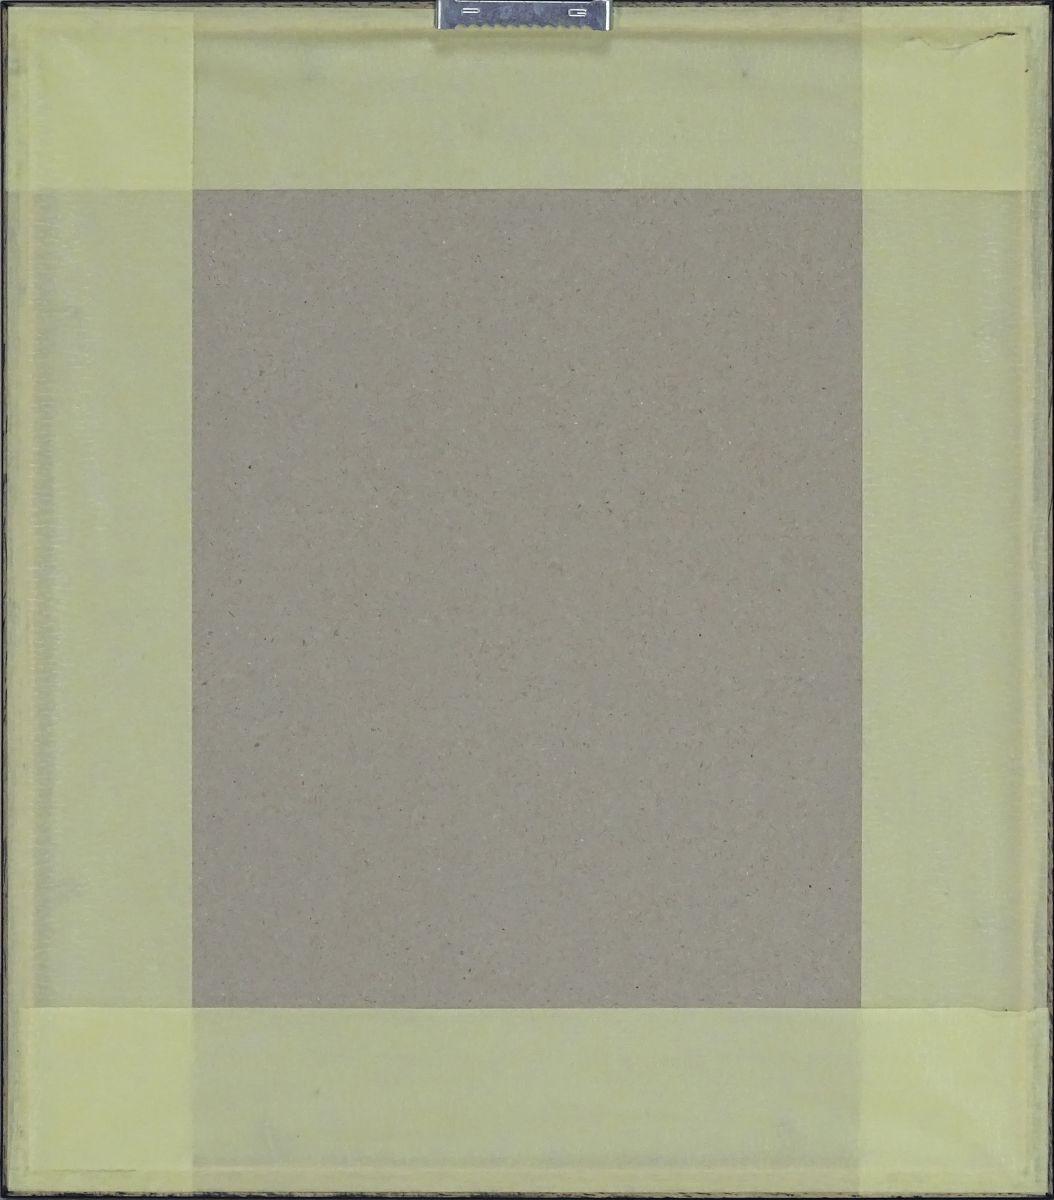 DSC03524.JPG (1054×1200)